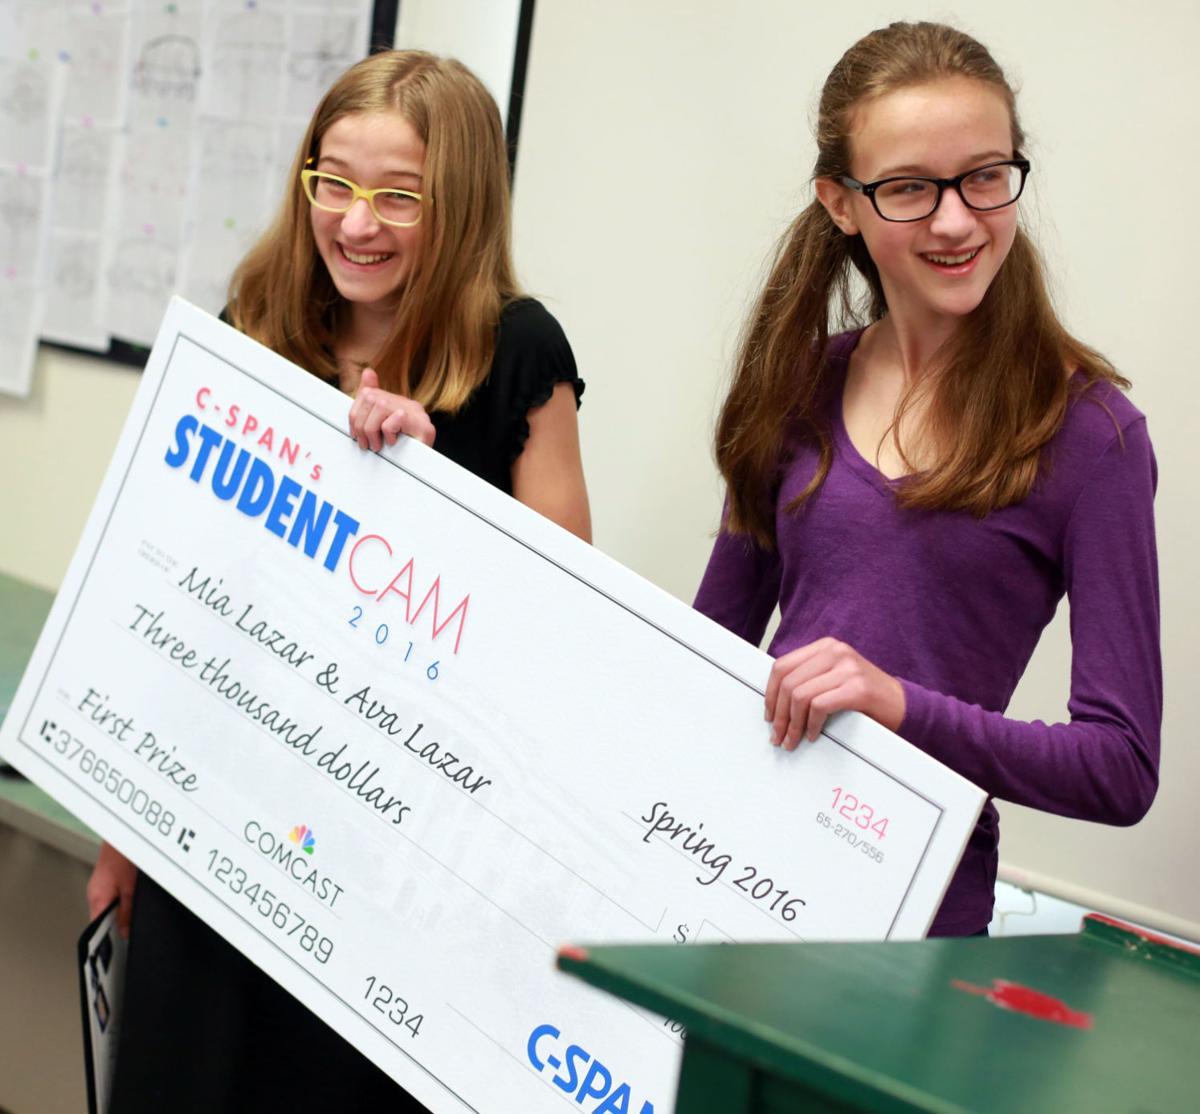 Blacksburg students' political film wins C-SPAN honors | Local News